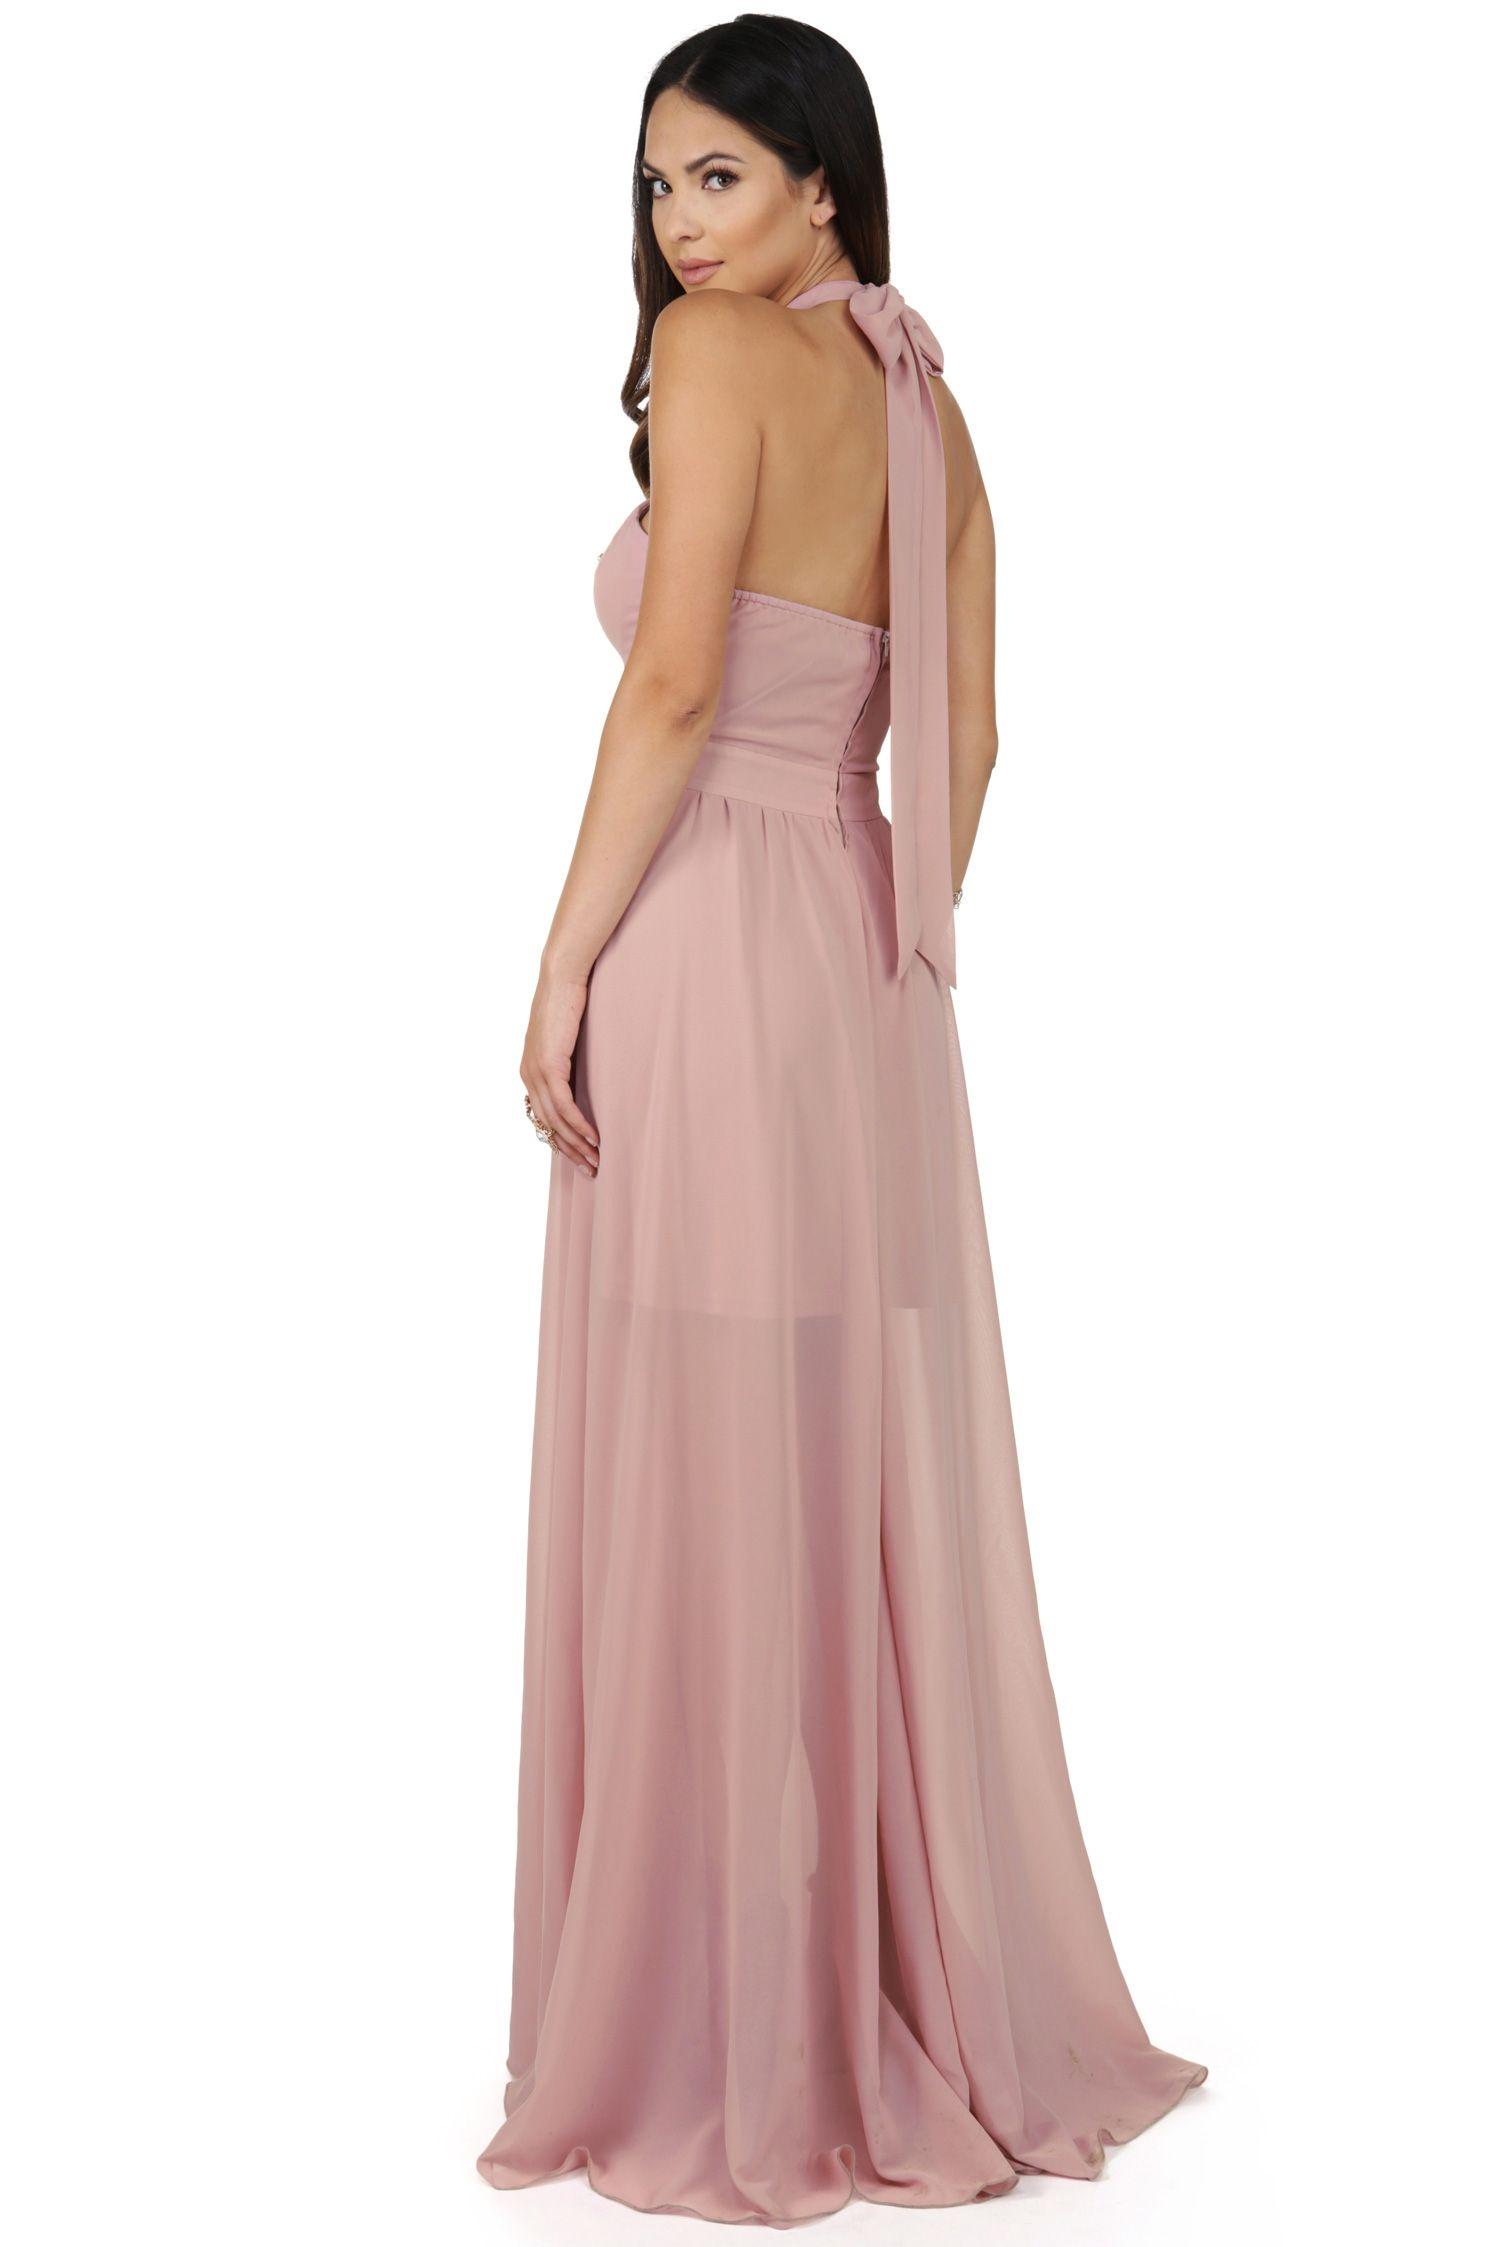 Lyla Mauve Formal Dress Mauve Formal And Prom